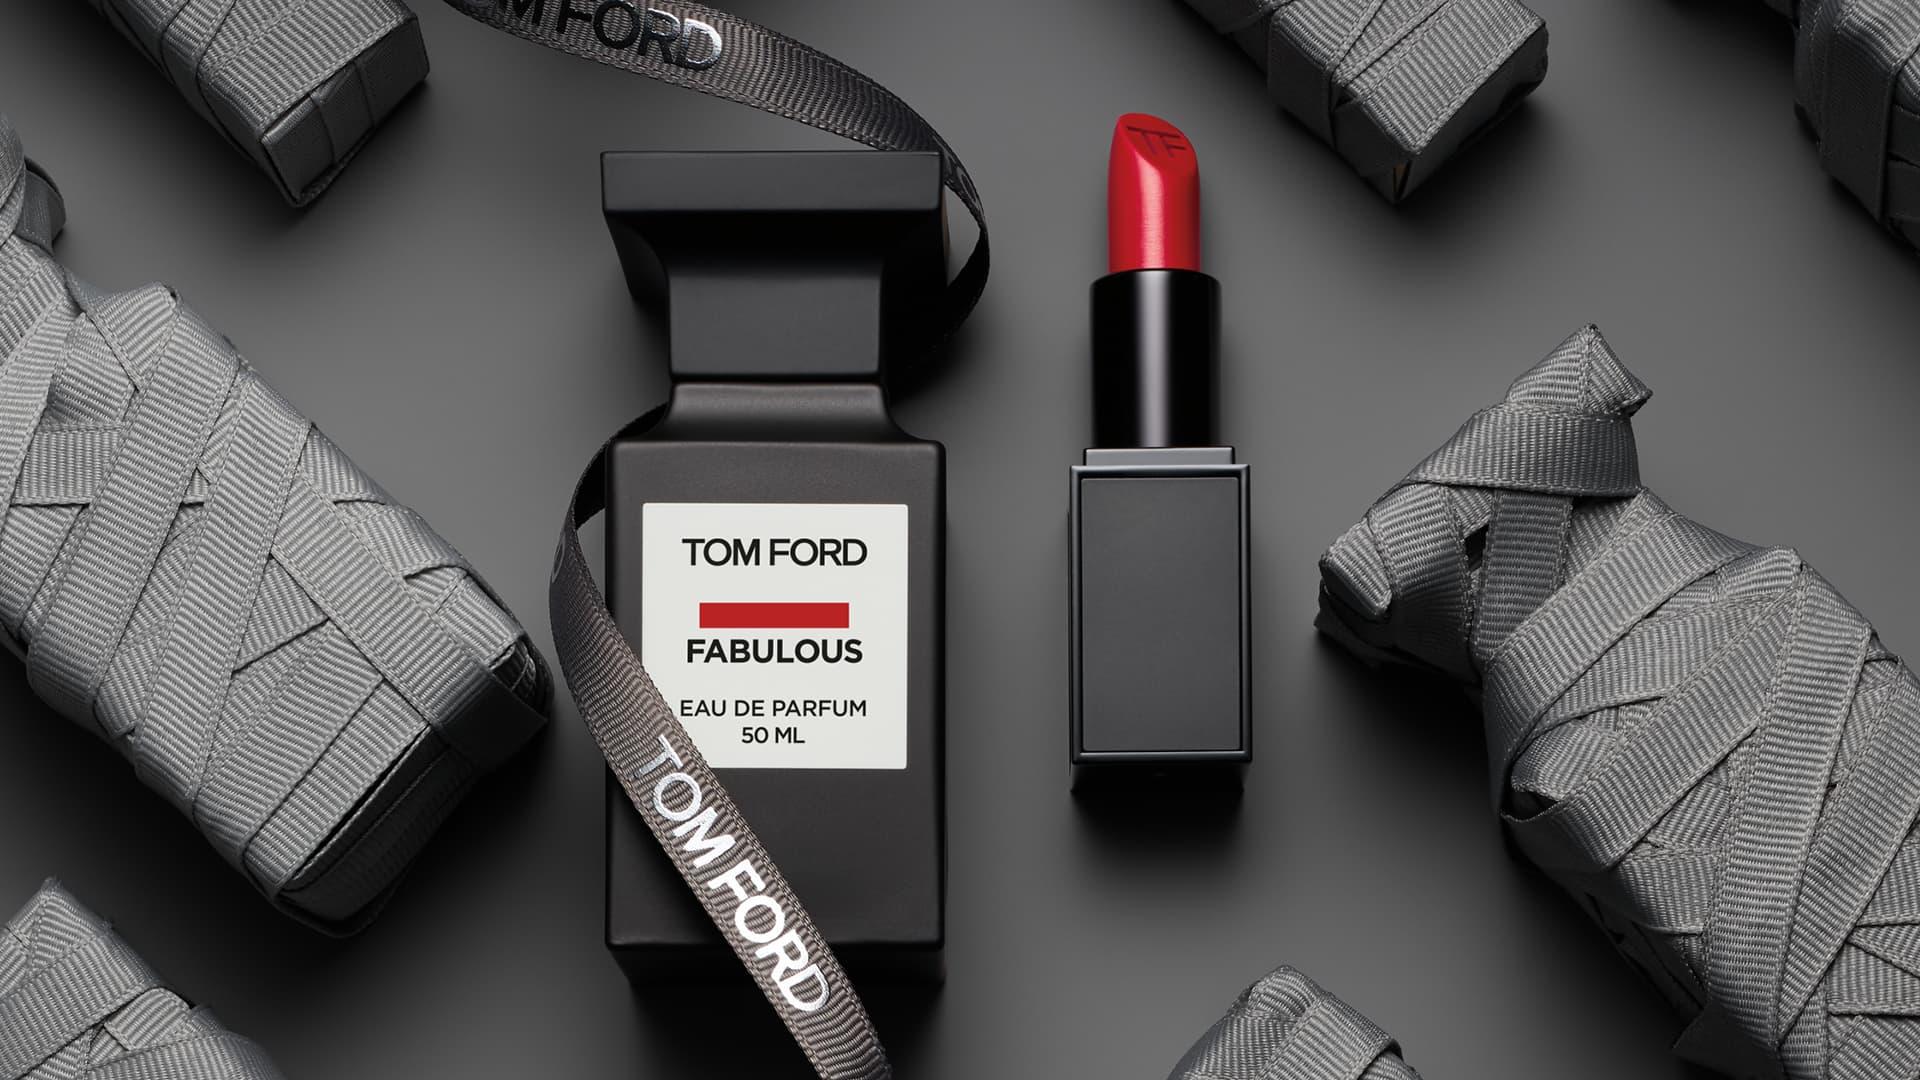 Tom Ford Perfume Lipstick Cosmetics More David Jones 1920x1080